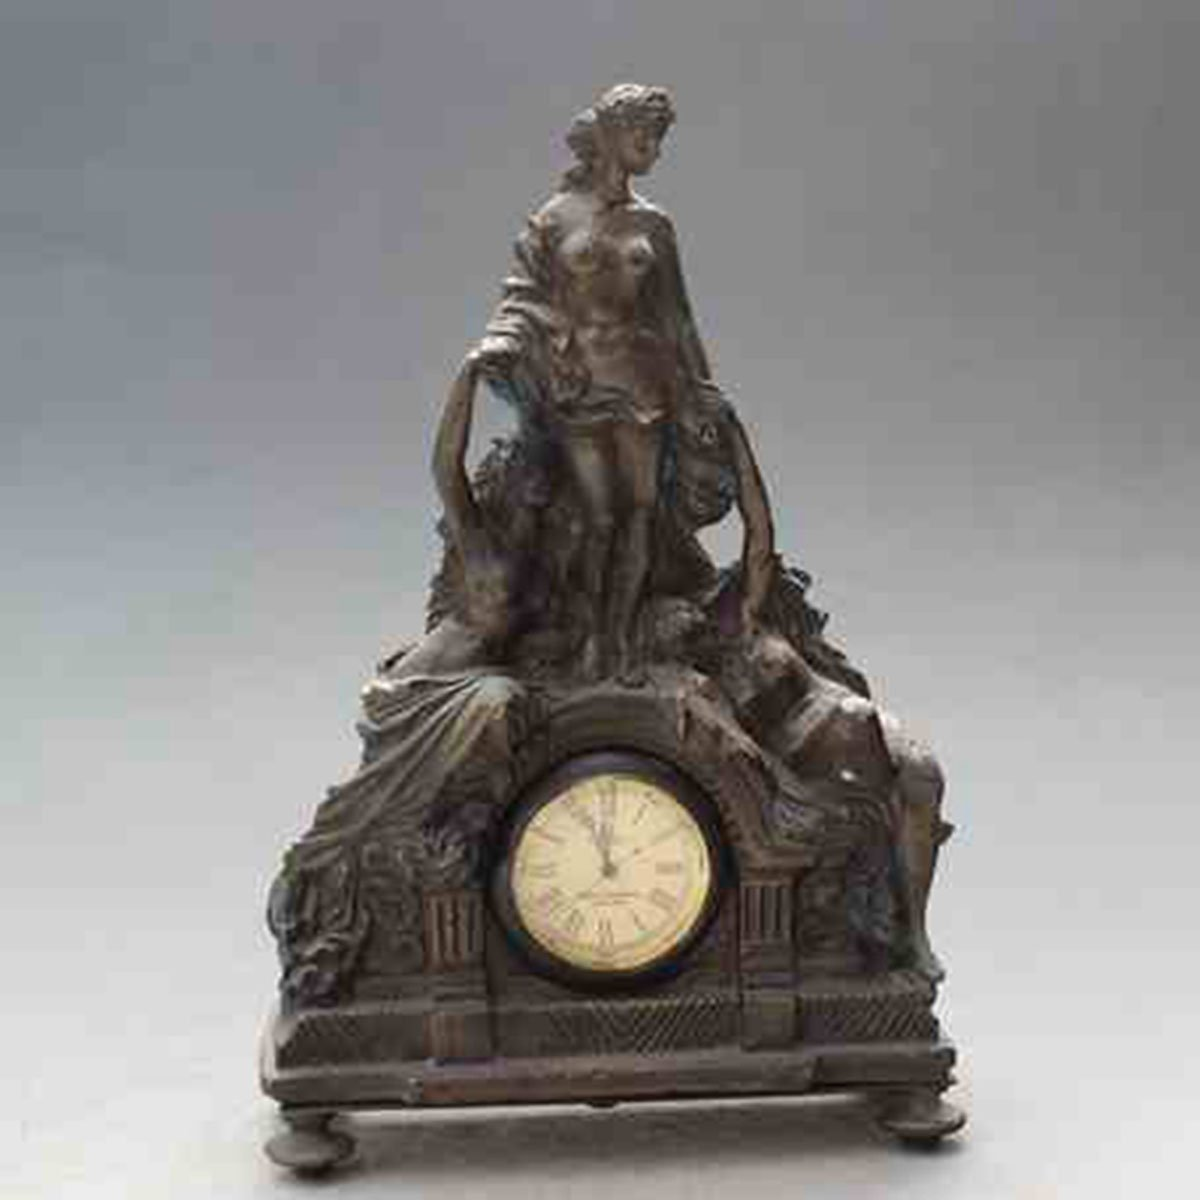 European Beauty modelling copper watch Mechanics Desk clock Arts and Crafts